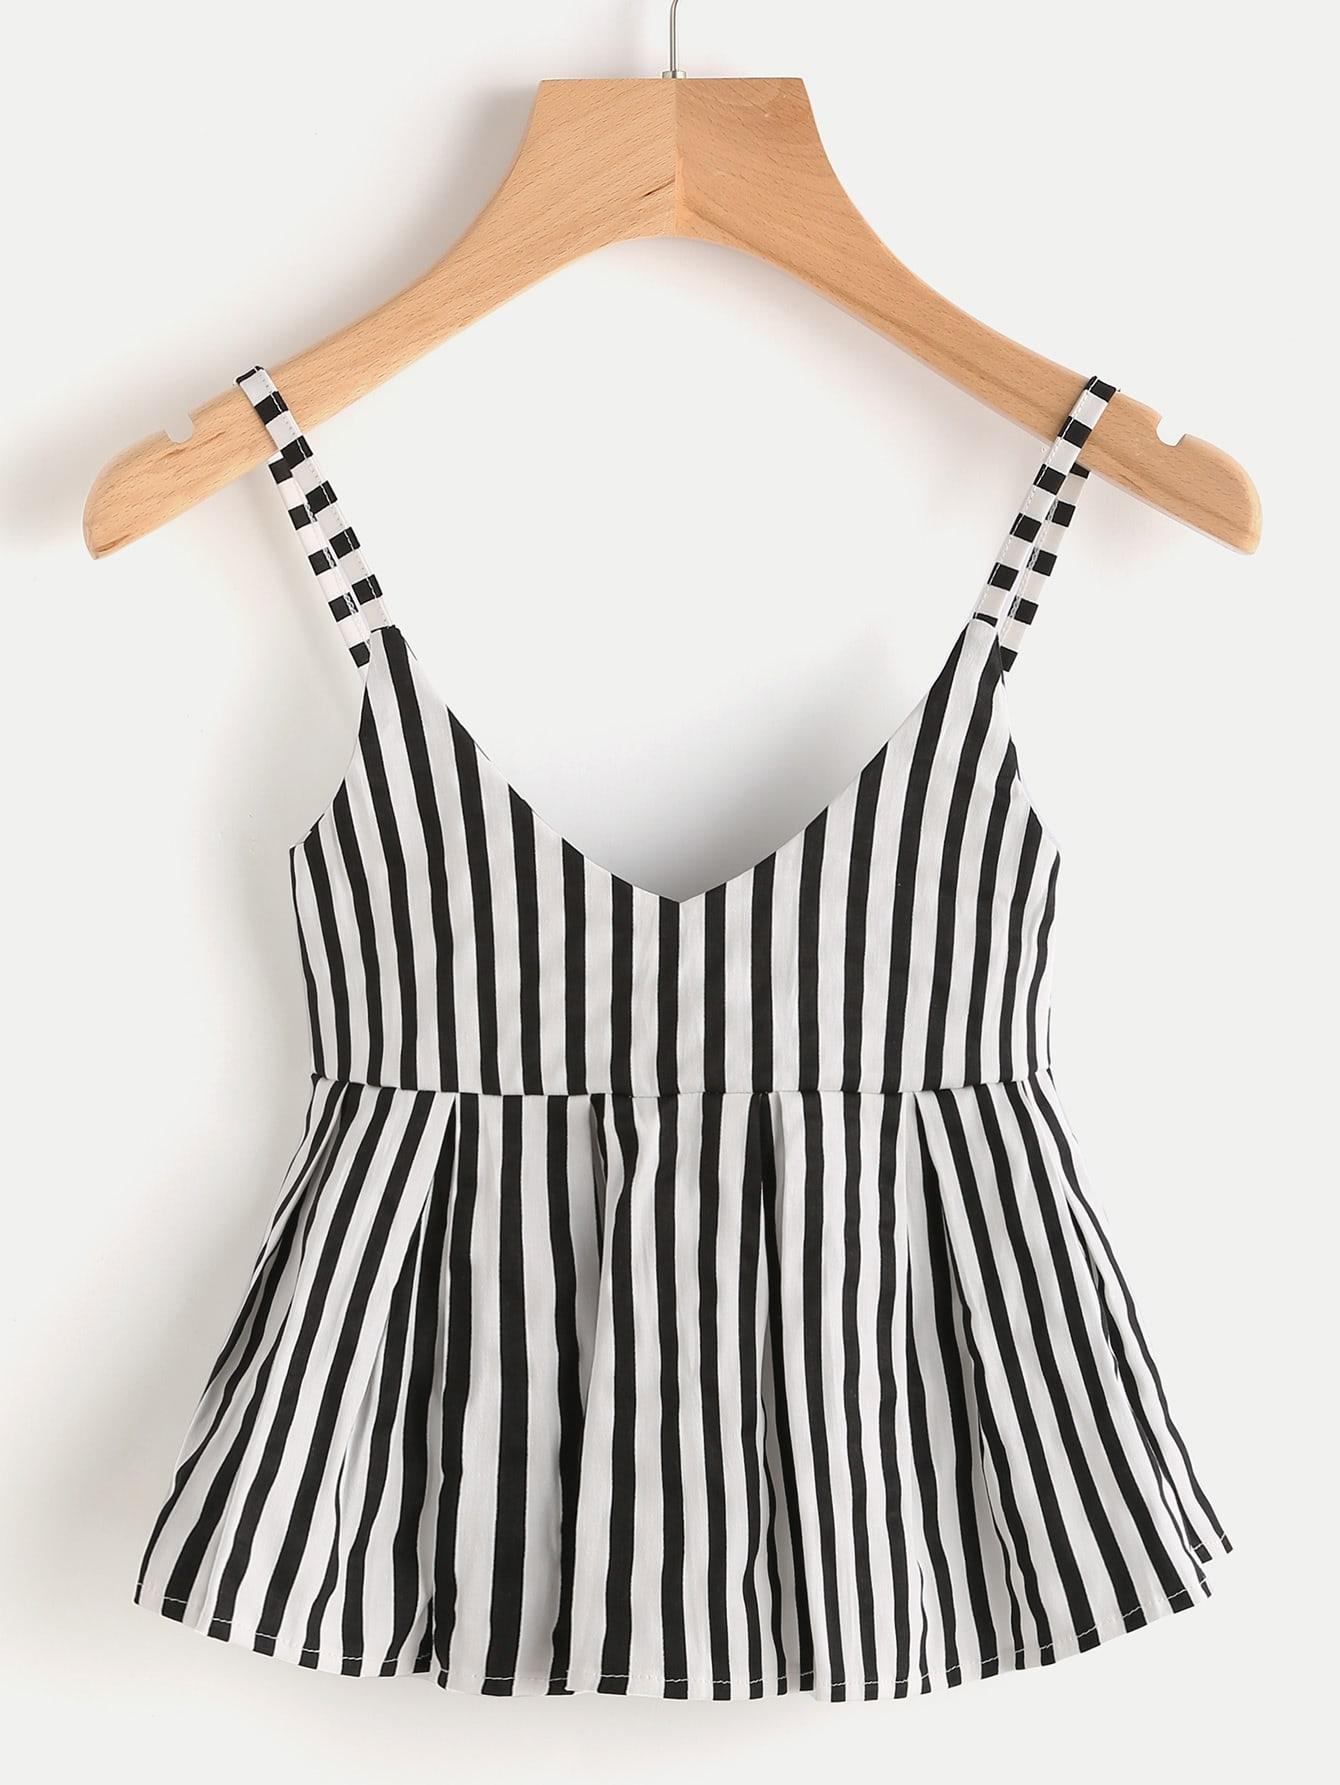 V Neckline Vertical Striped Babydoll Cami Top RVES170509103